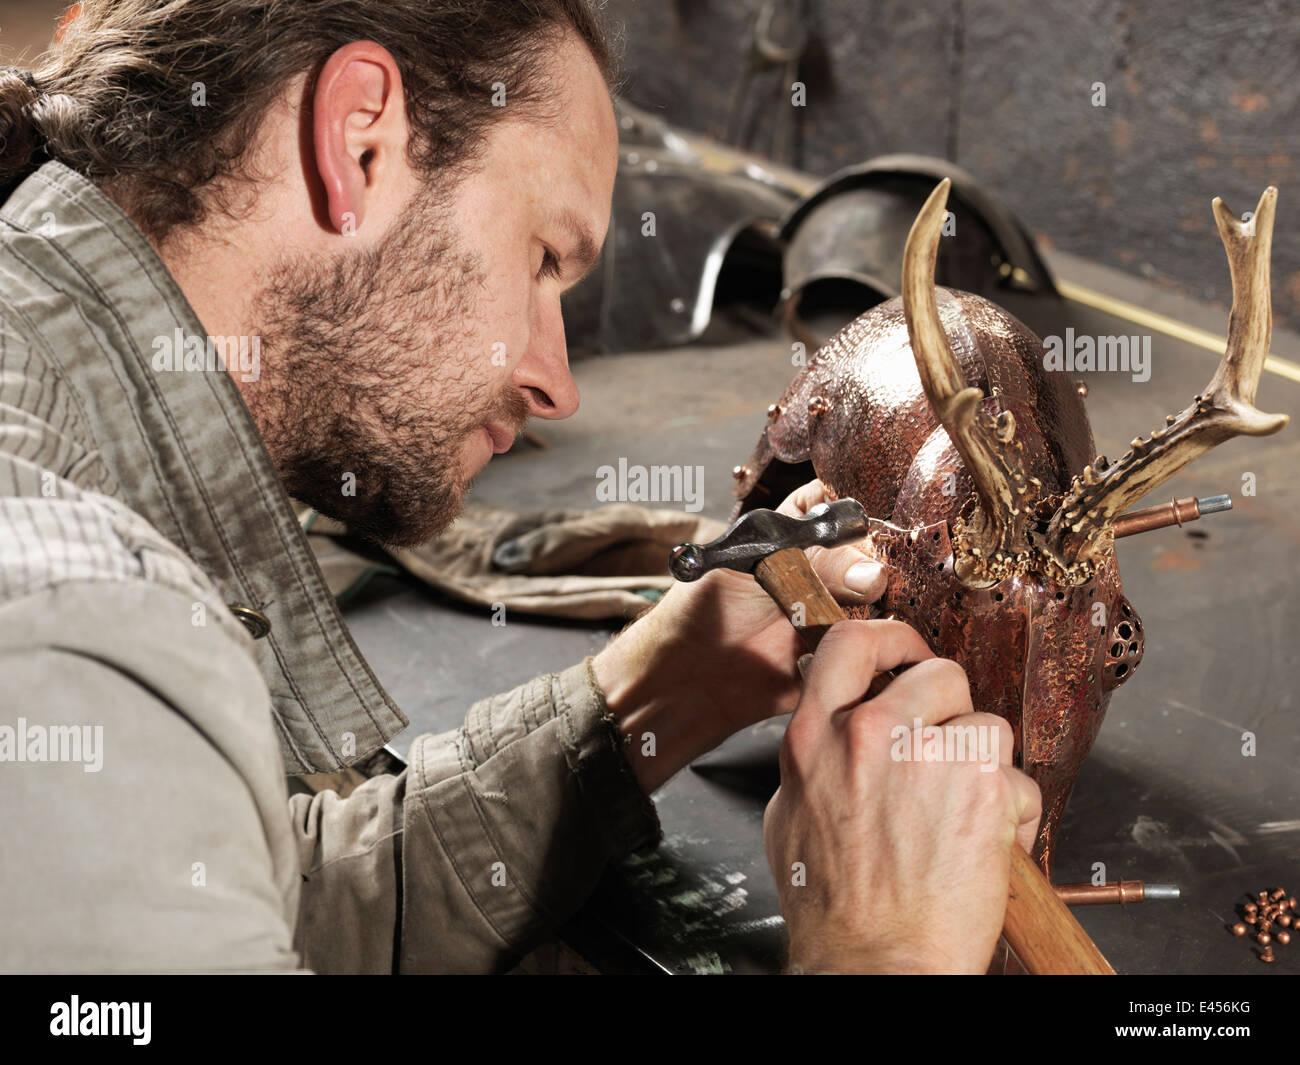 Blacksmith hammering copper on deer sculpture in workshop - Stock Image